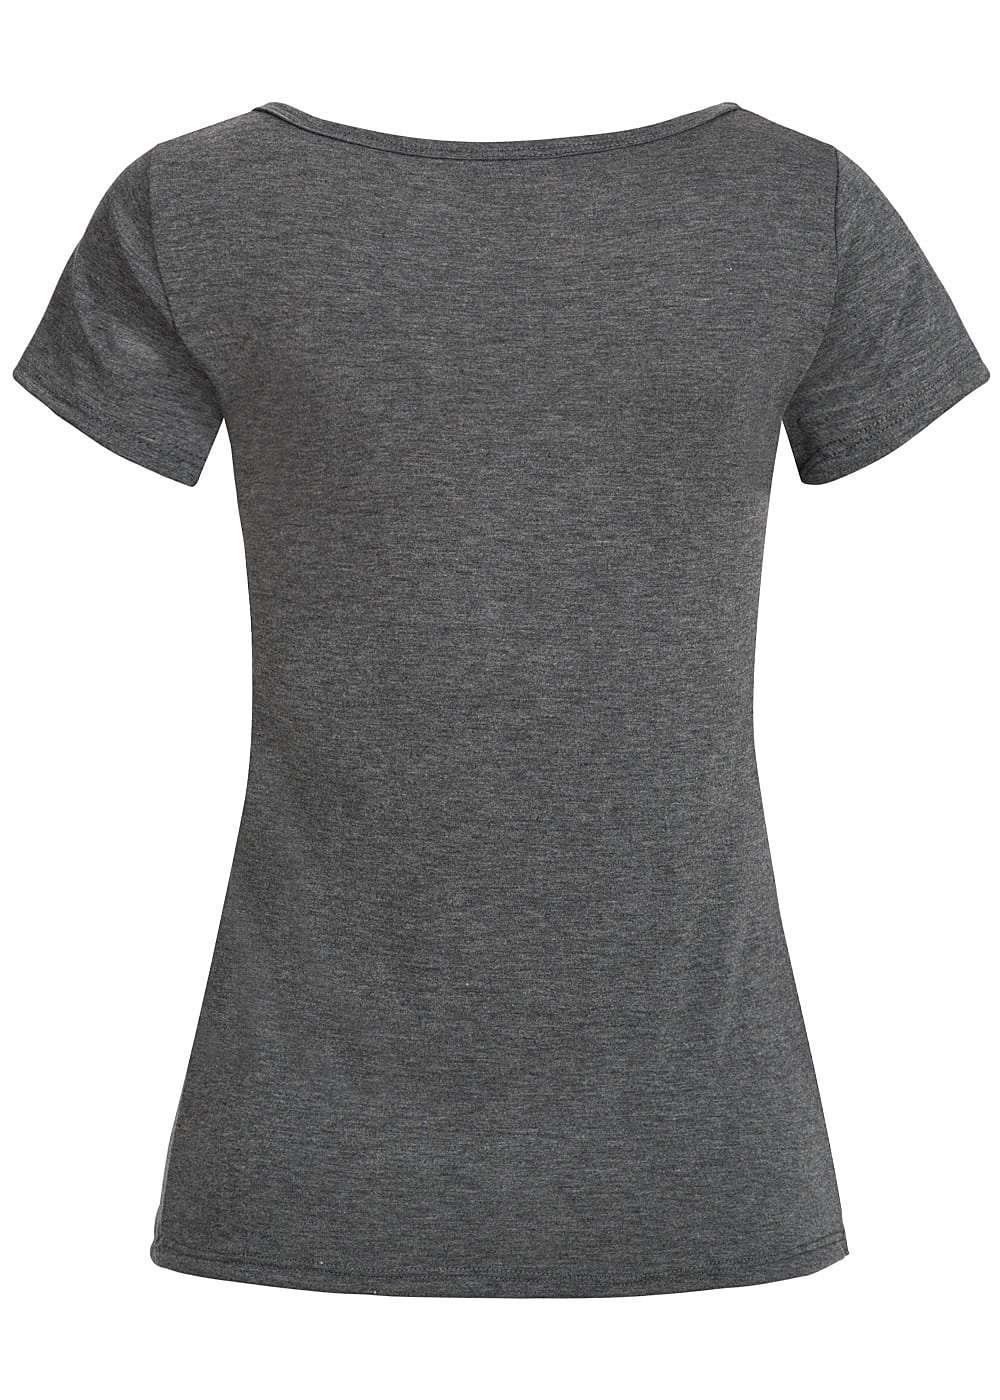 styleboom fashion damen t shirt mit patches dunkel grau. Black Bedroom Furniture Sets. Home Design Ideas